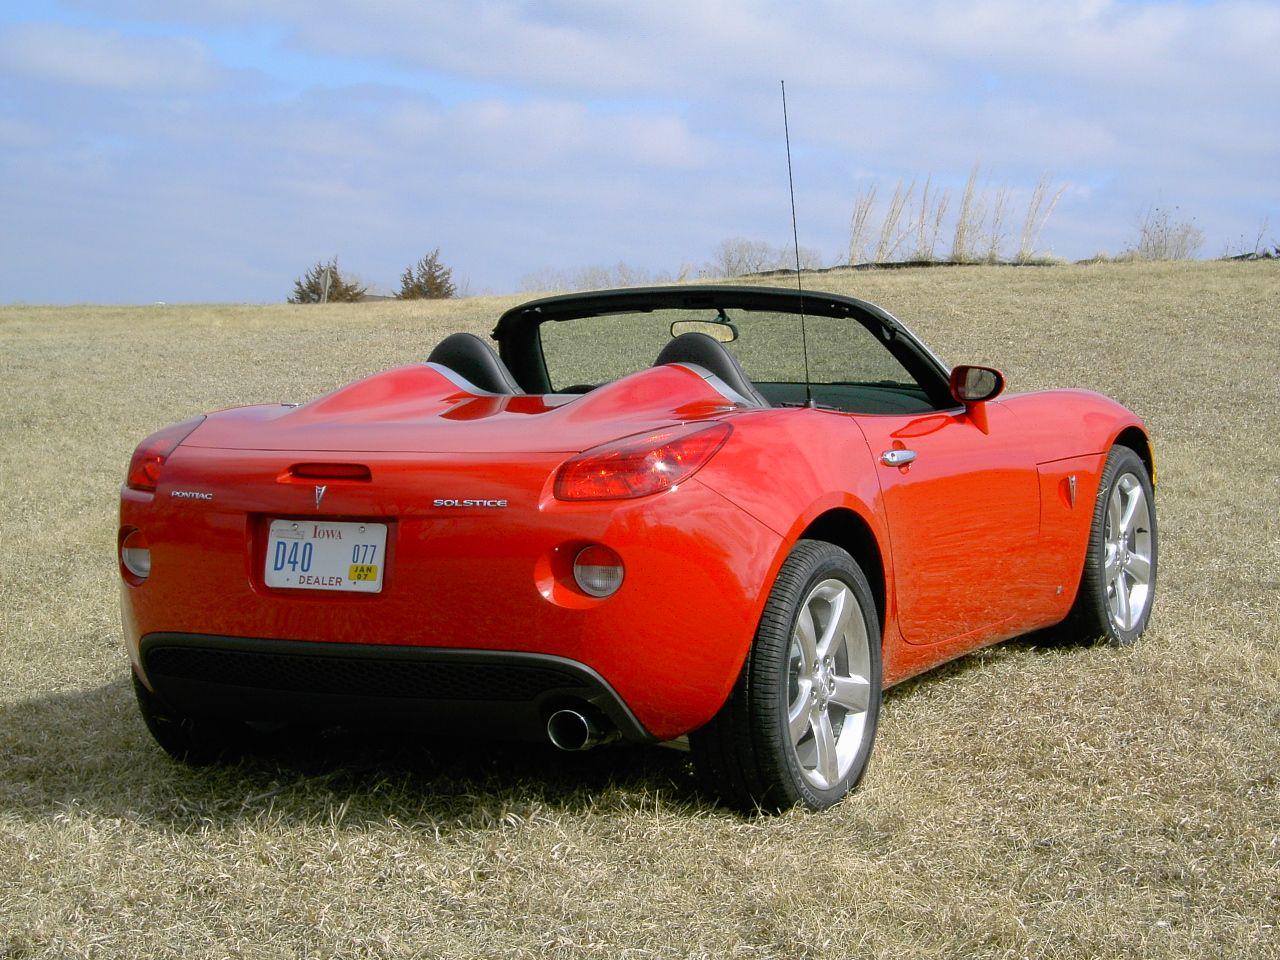 2006 Pontiac Solstice convertible rear Pontiac